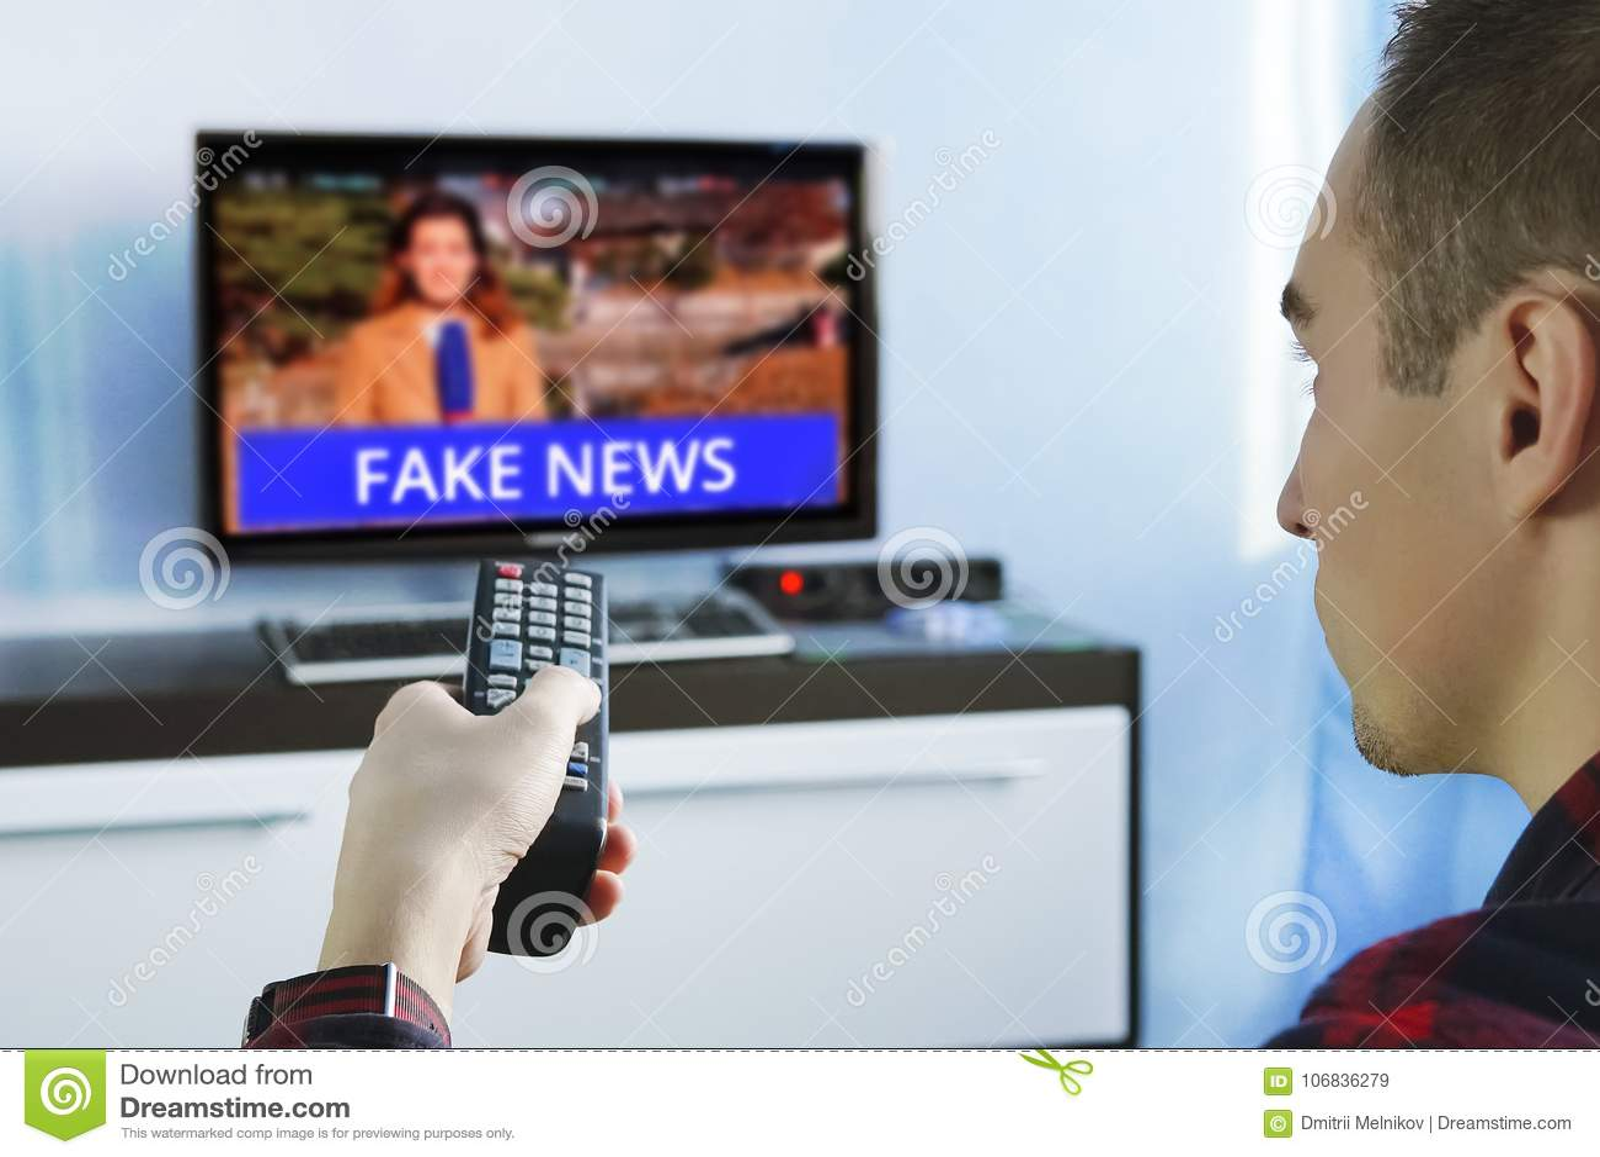 Fake News Propaganda HOAX Political TV Internet Social